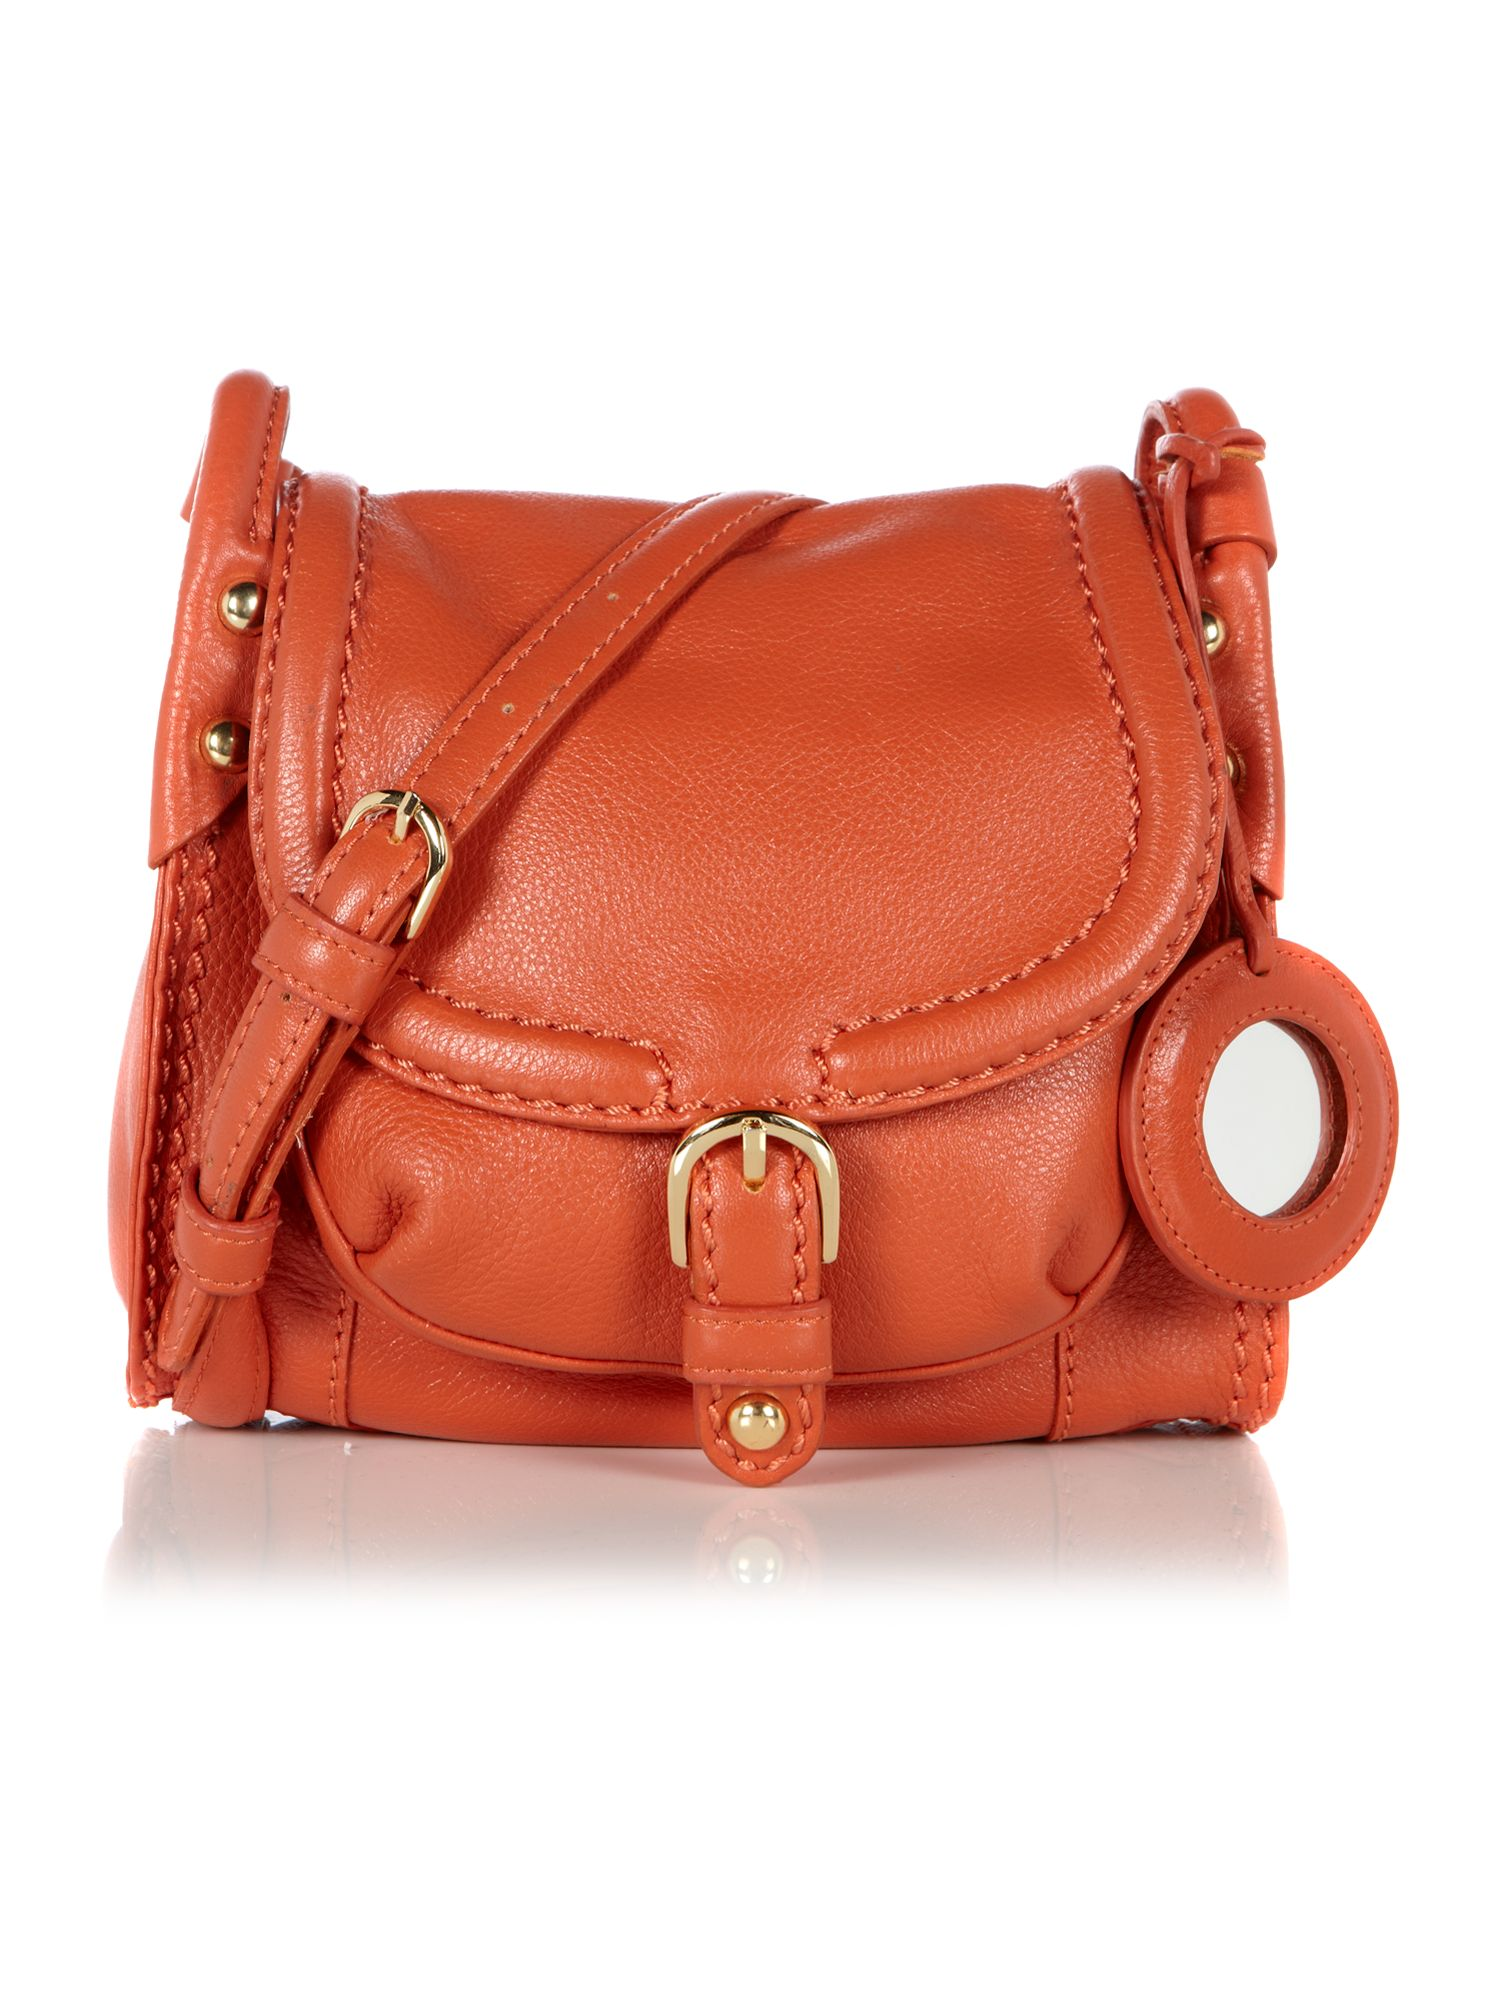 609ad486a0 Women s Mary Portas   Radley Holloway small cross body bag